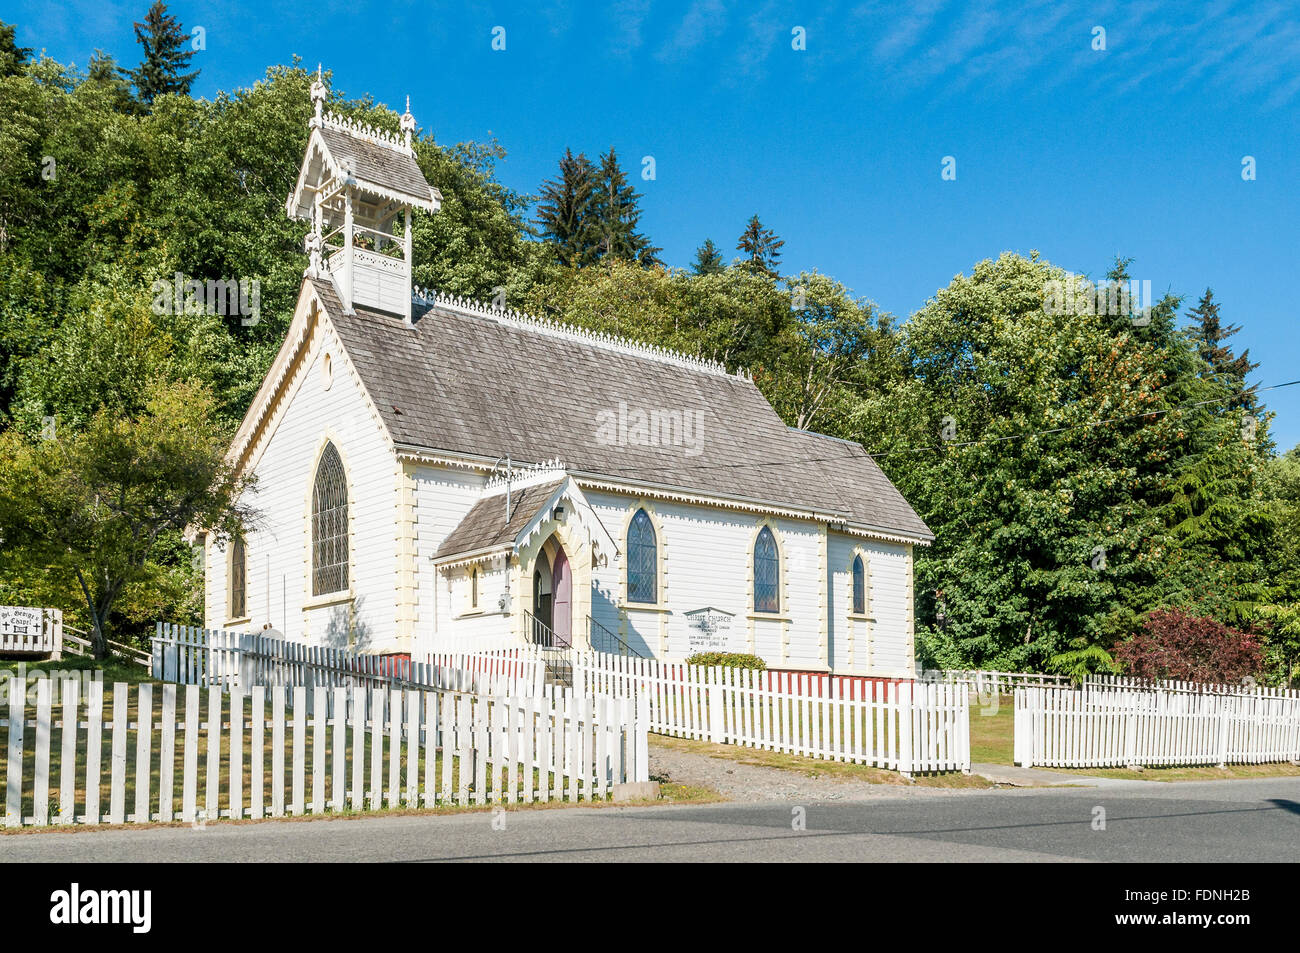 Anglican Church, Alert Bay, Cormorant Island,  British Columbia, Canada - Stock Image